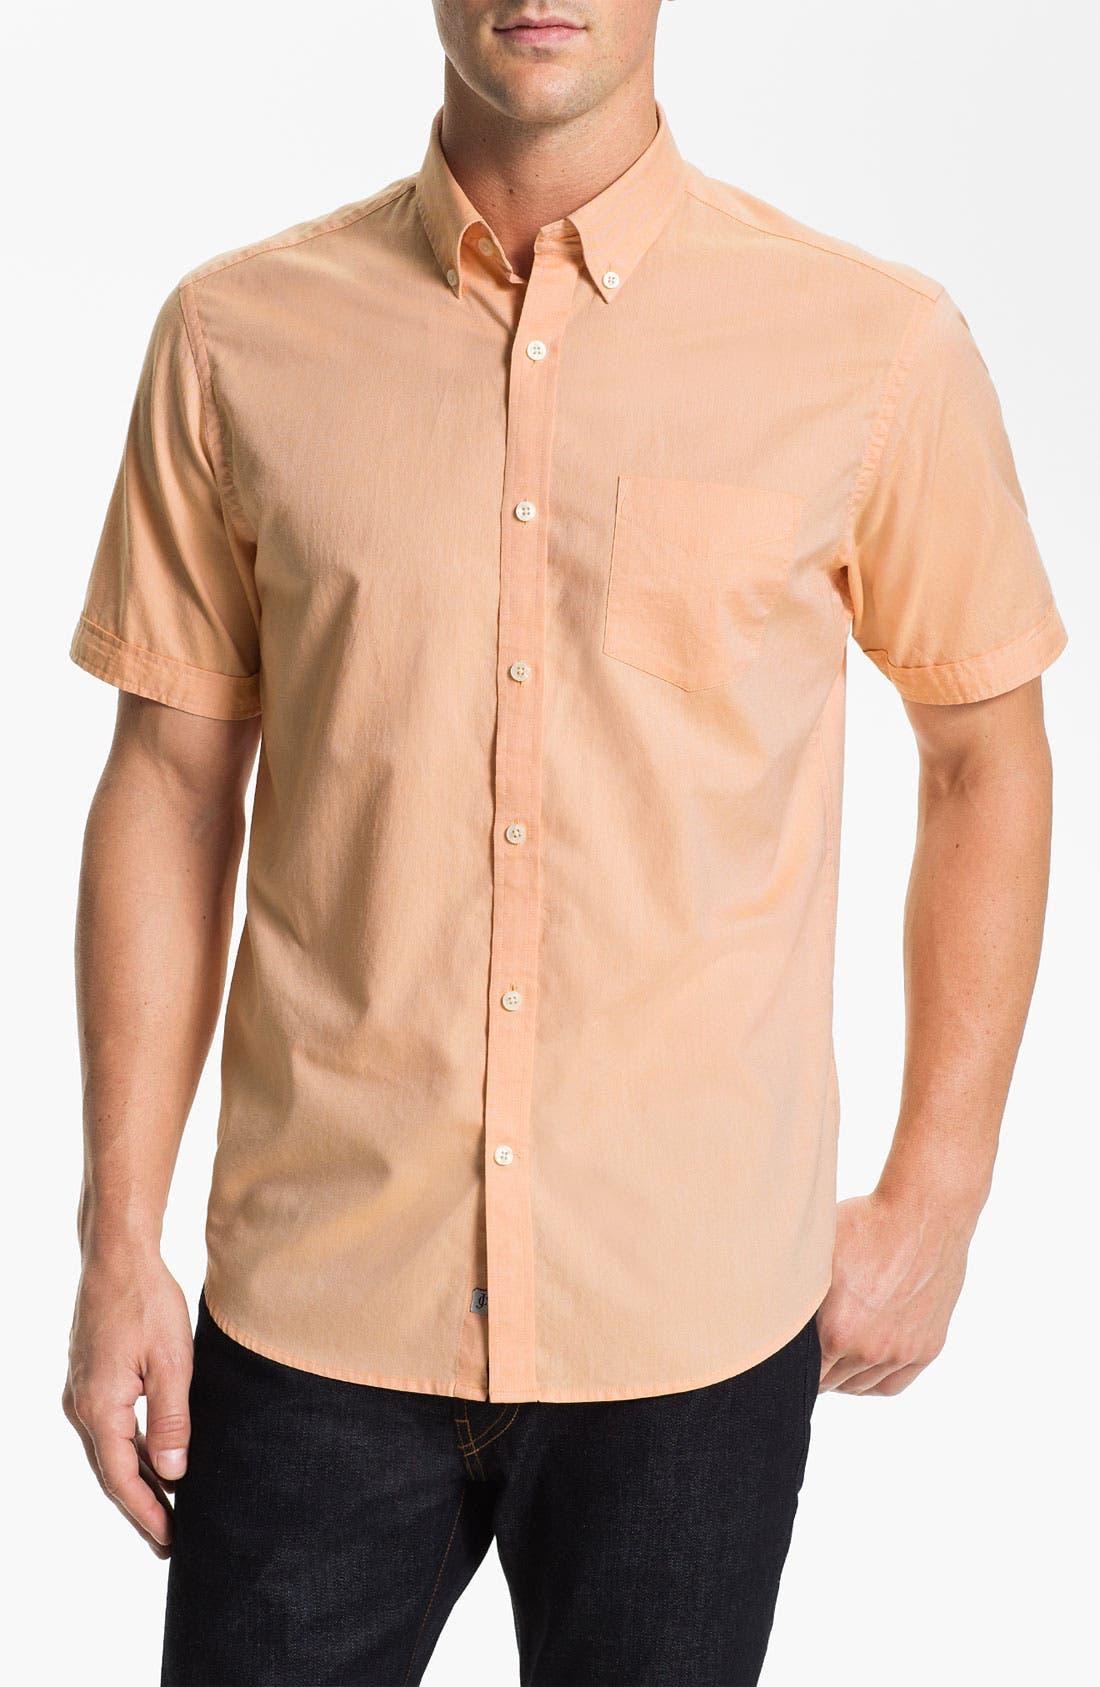 Alternate Image 1 Selected - James Campbell 'Artesia' Sport Shirt